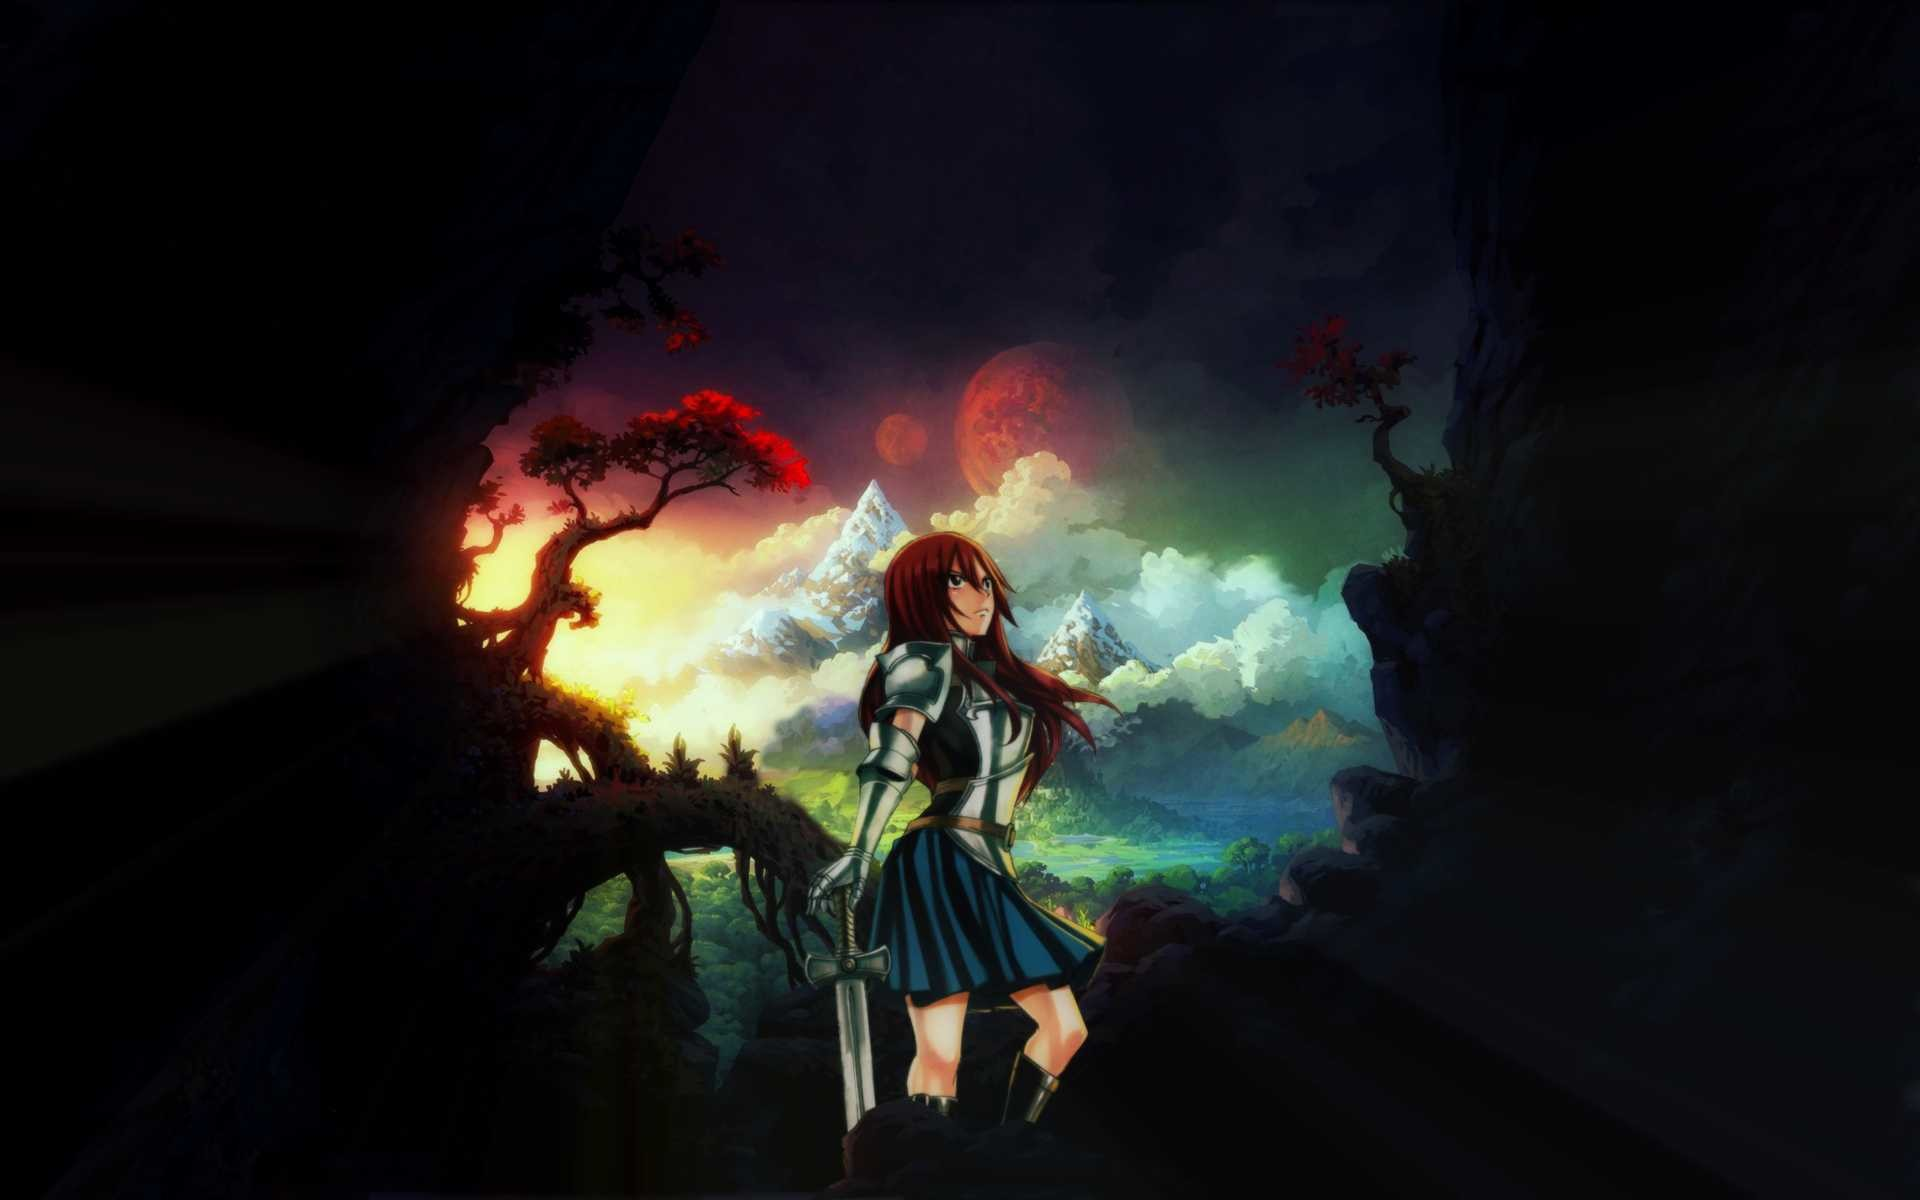 Res: 1920x1200, Hd Fairy Tail Wallpaper Dark 1080p Of Desktop Pics